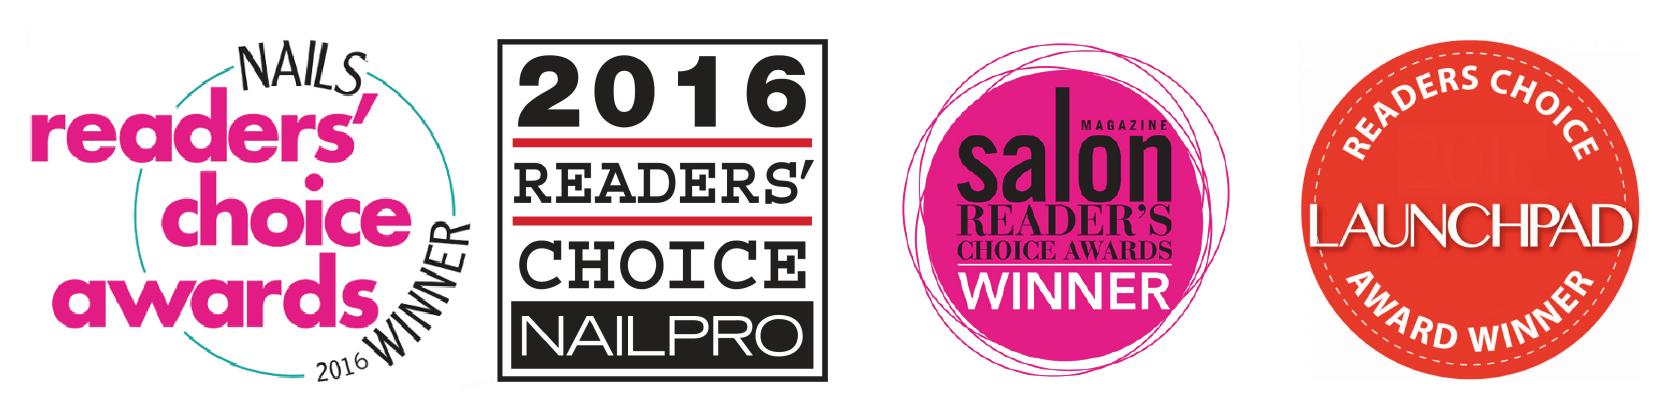 JCasado-prémios-readers-choice-awards